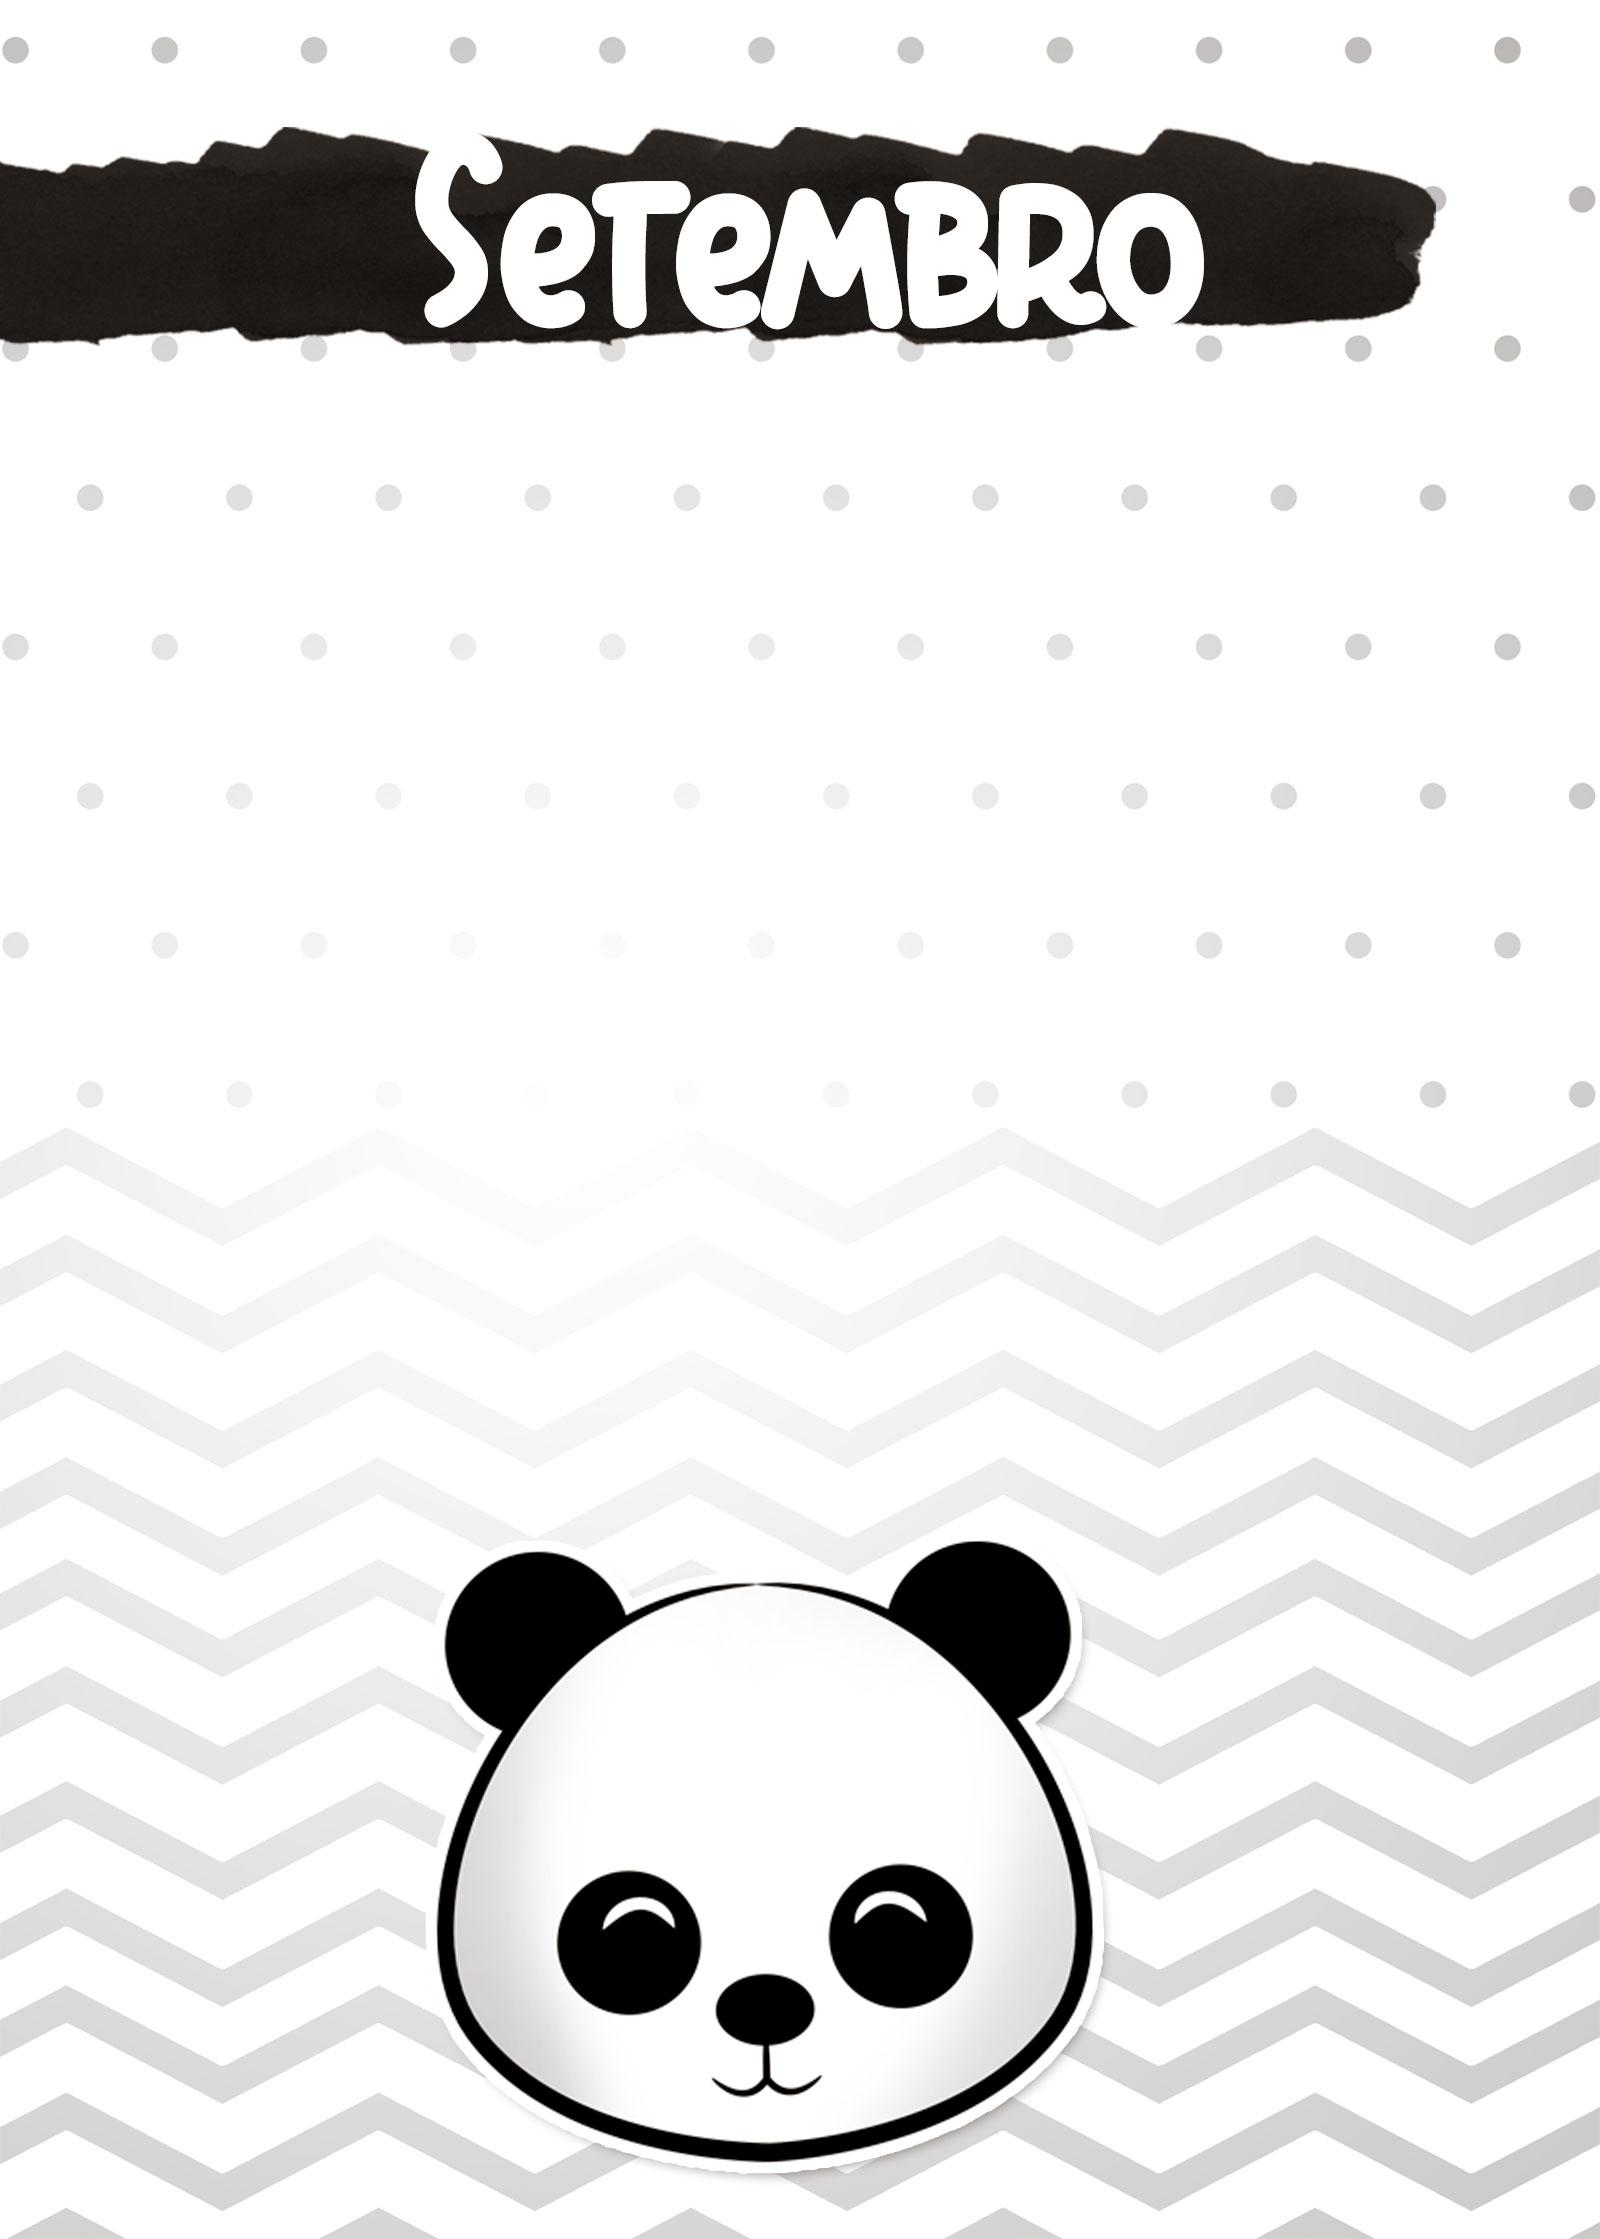 Planners 2019 Panda Menino capa setembro